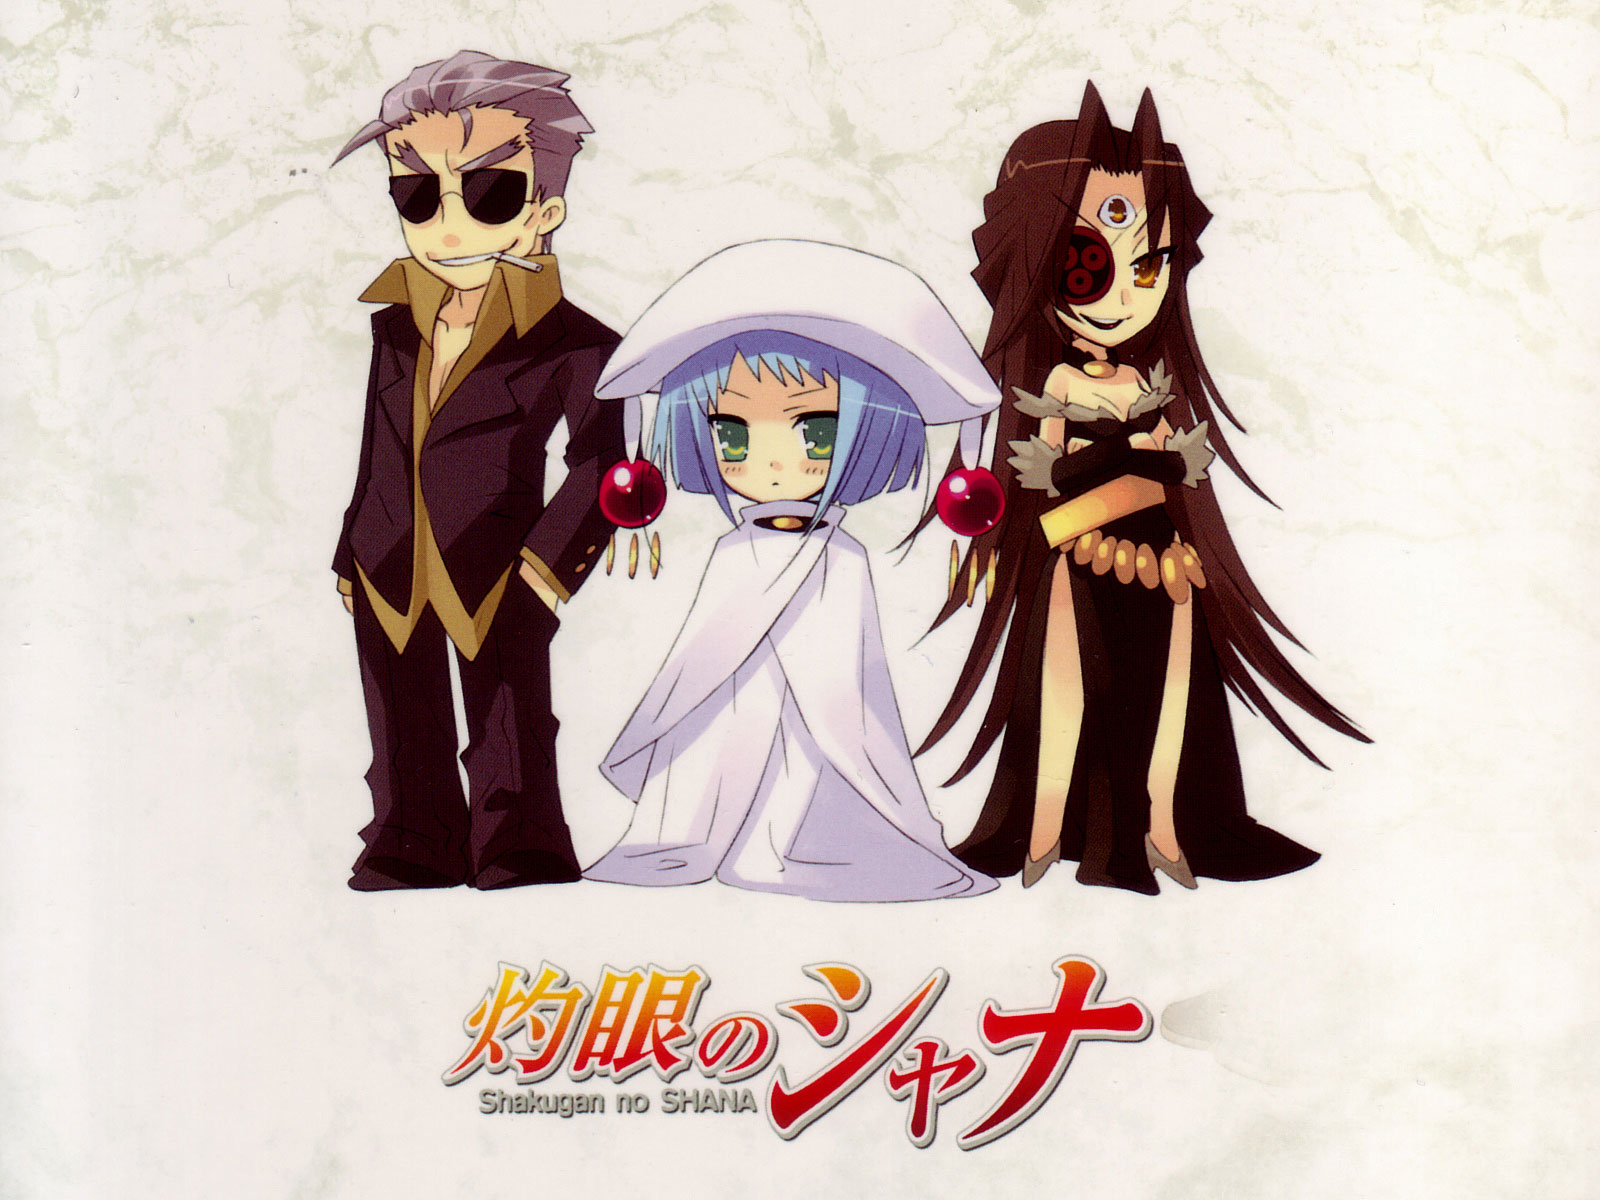 Konachan.com - 35580 bel_peol eyepatch hecate shakugan_no_shana sydonay